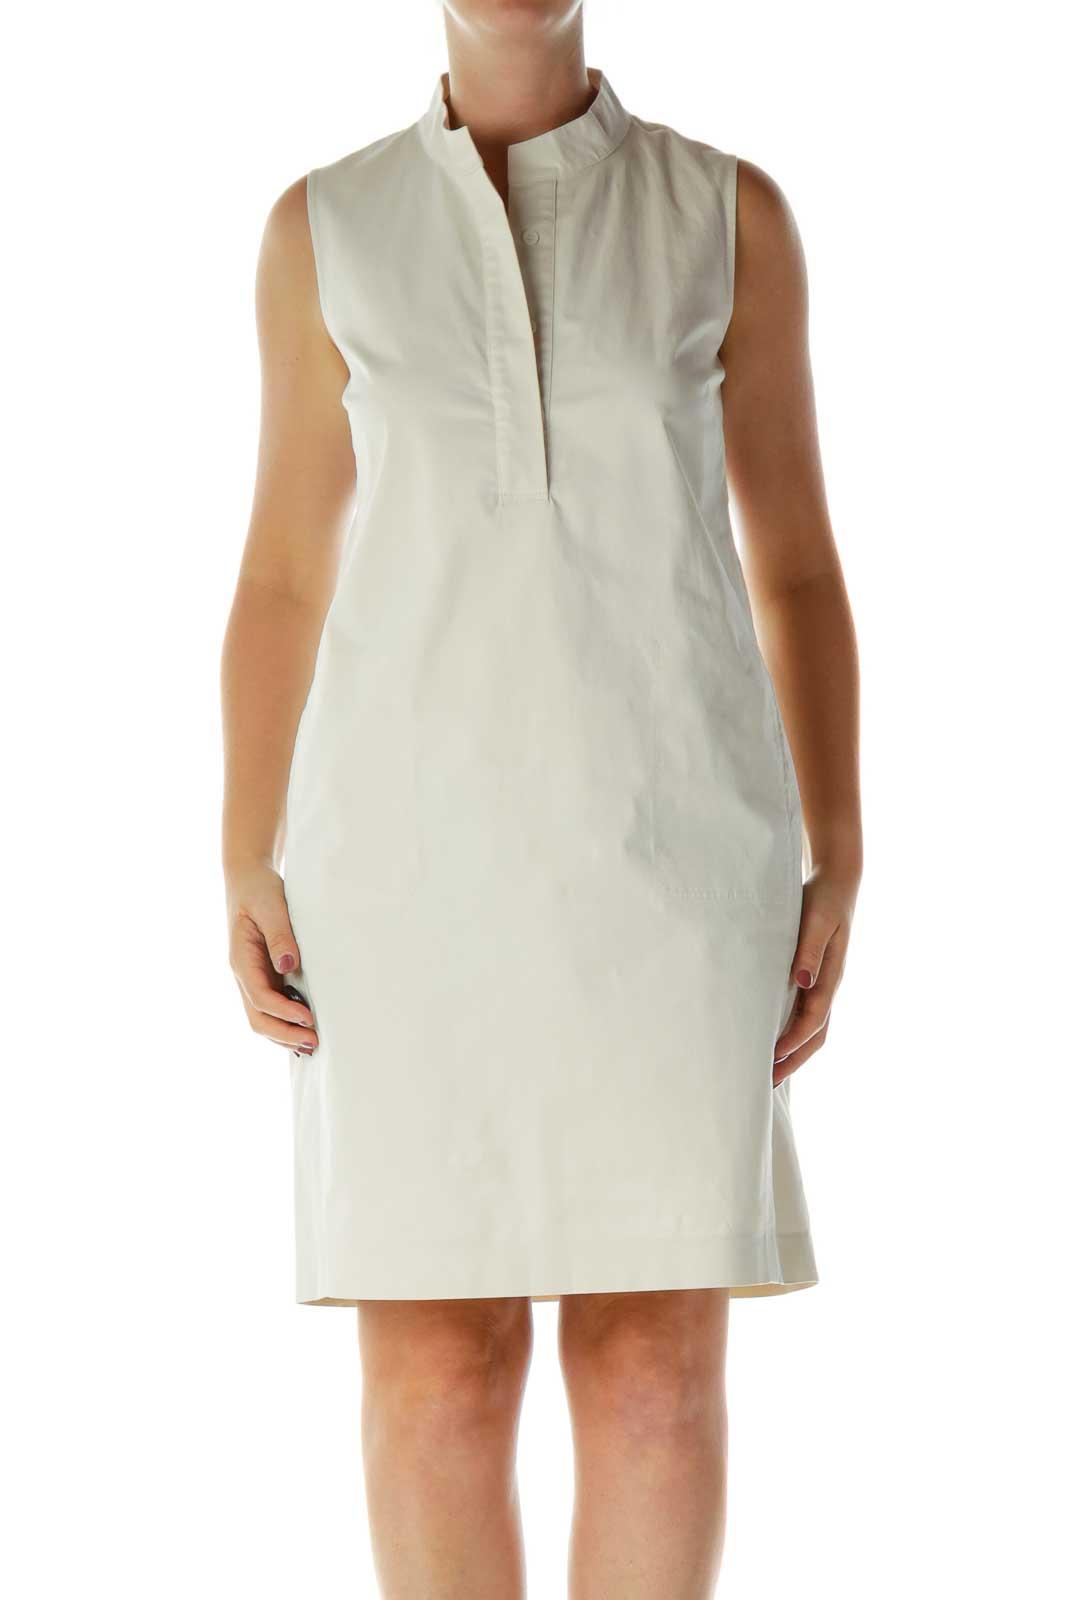 Cream Khaki Sleeveless Work Dress Front